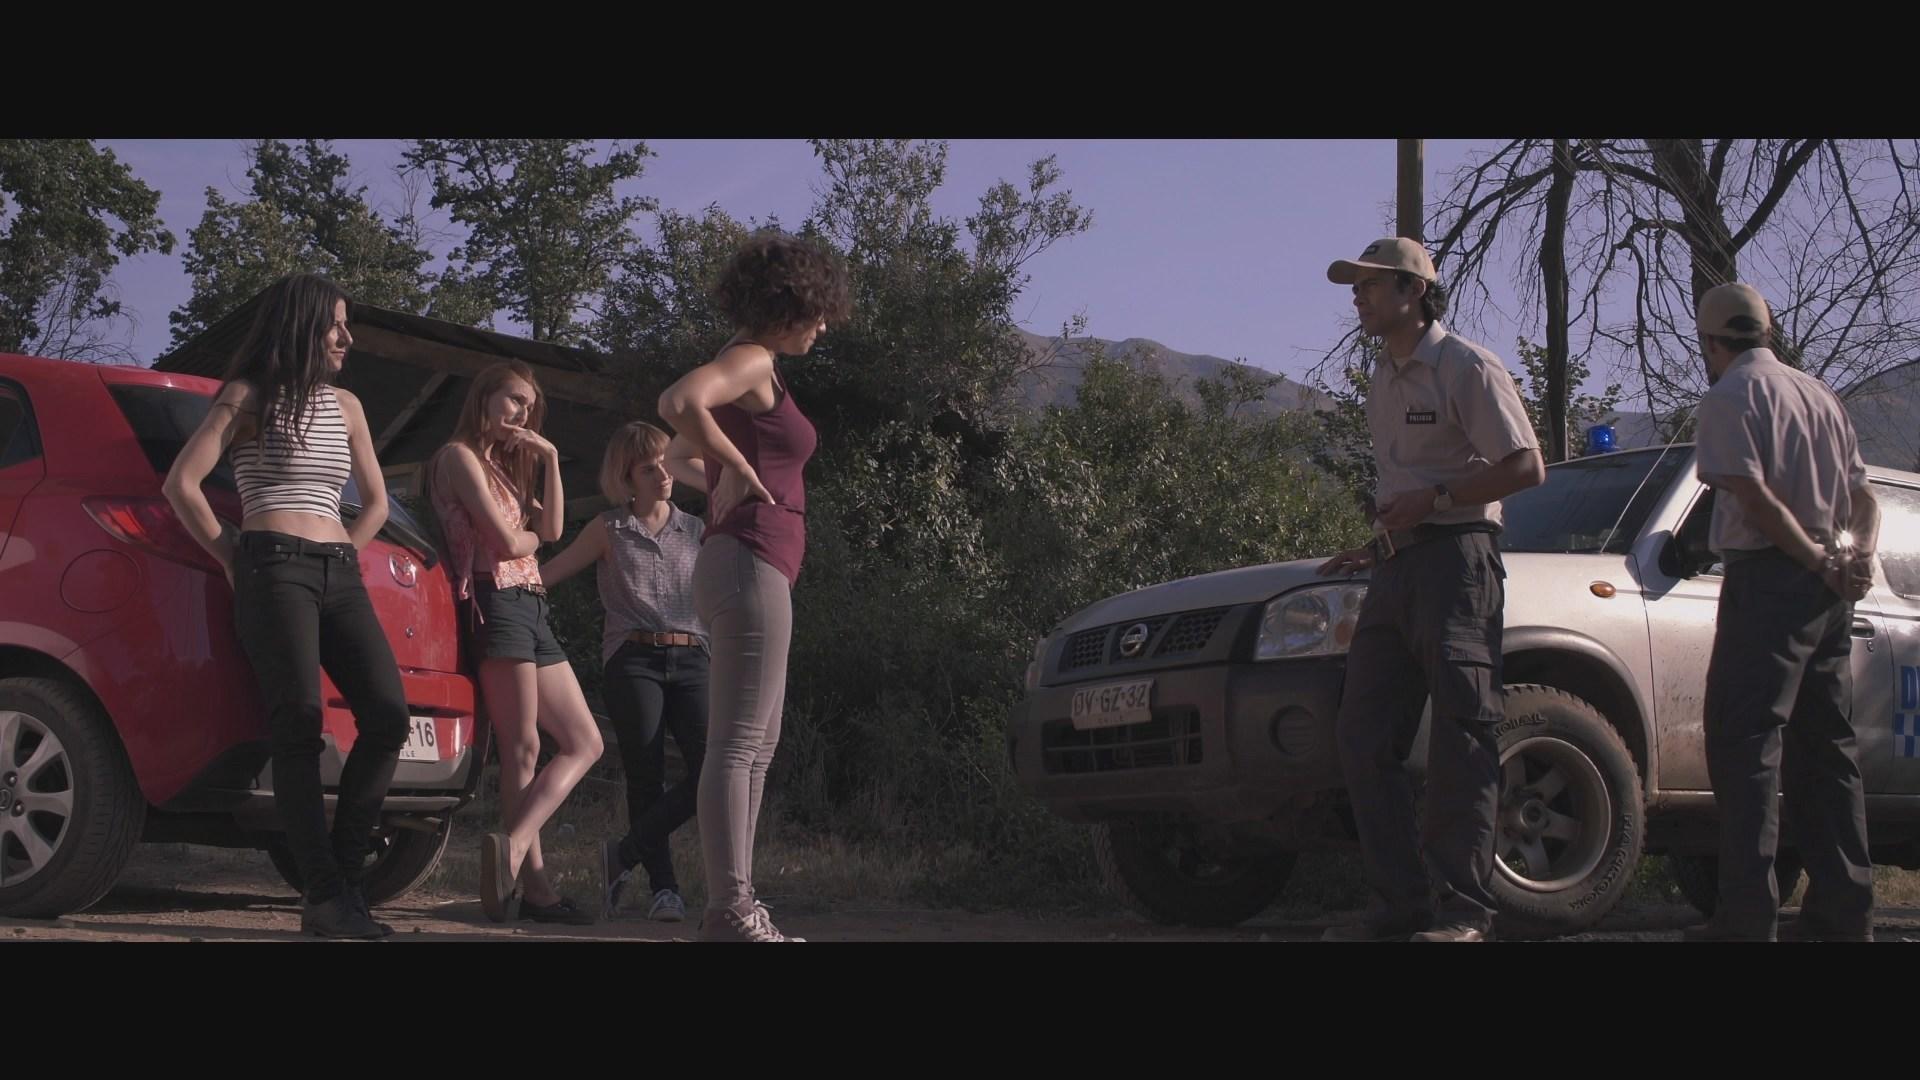 Eduardo Paxeco, Catalina Martin, Ximena del Solar, Macarena Carrere, and Dominga Bofill in Trauma (2017)